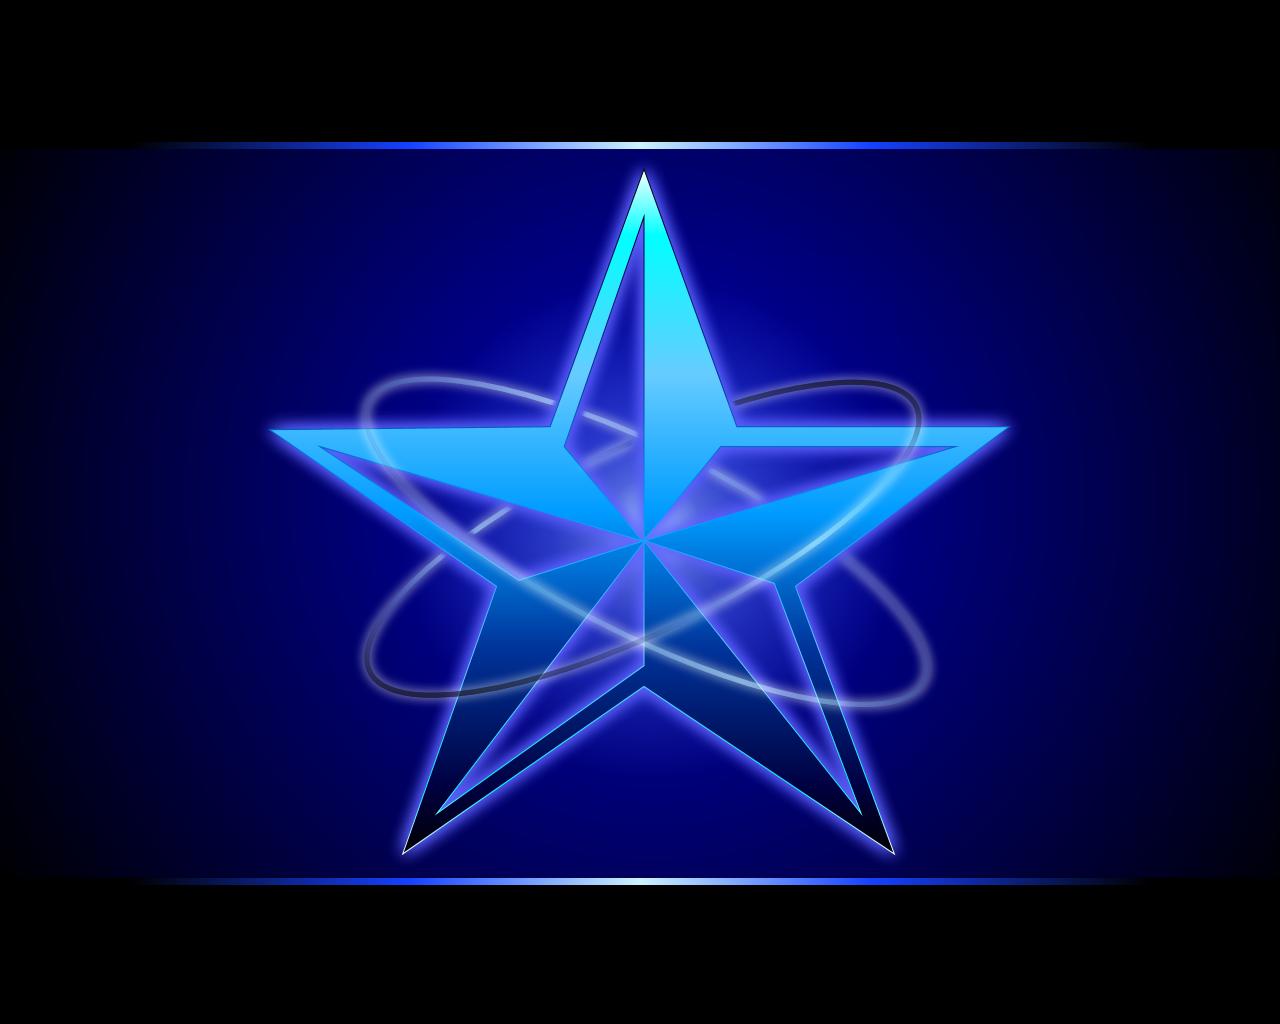 Star 1280x1024